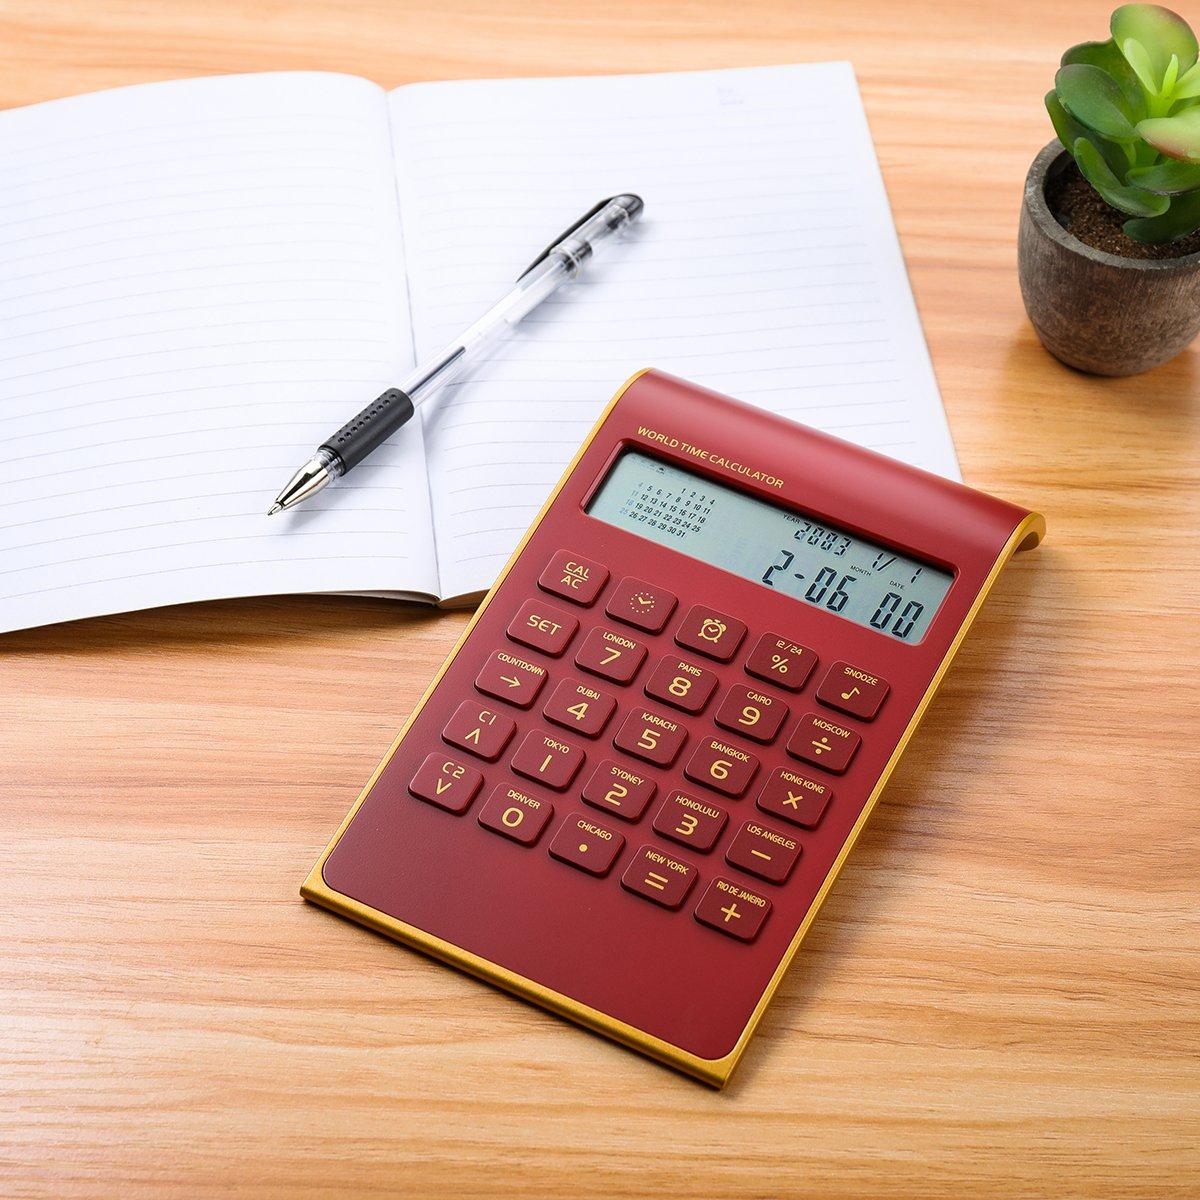 Caveen Calculator Ultra Thin Solar Power Calculator for Home Office Desktop Calculator Tilted LCD Display Business Calculator (Upgrade, Red)